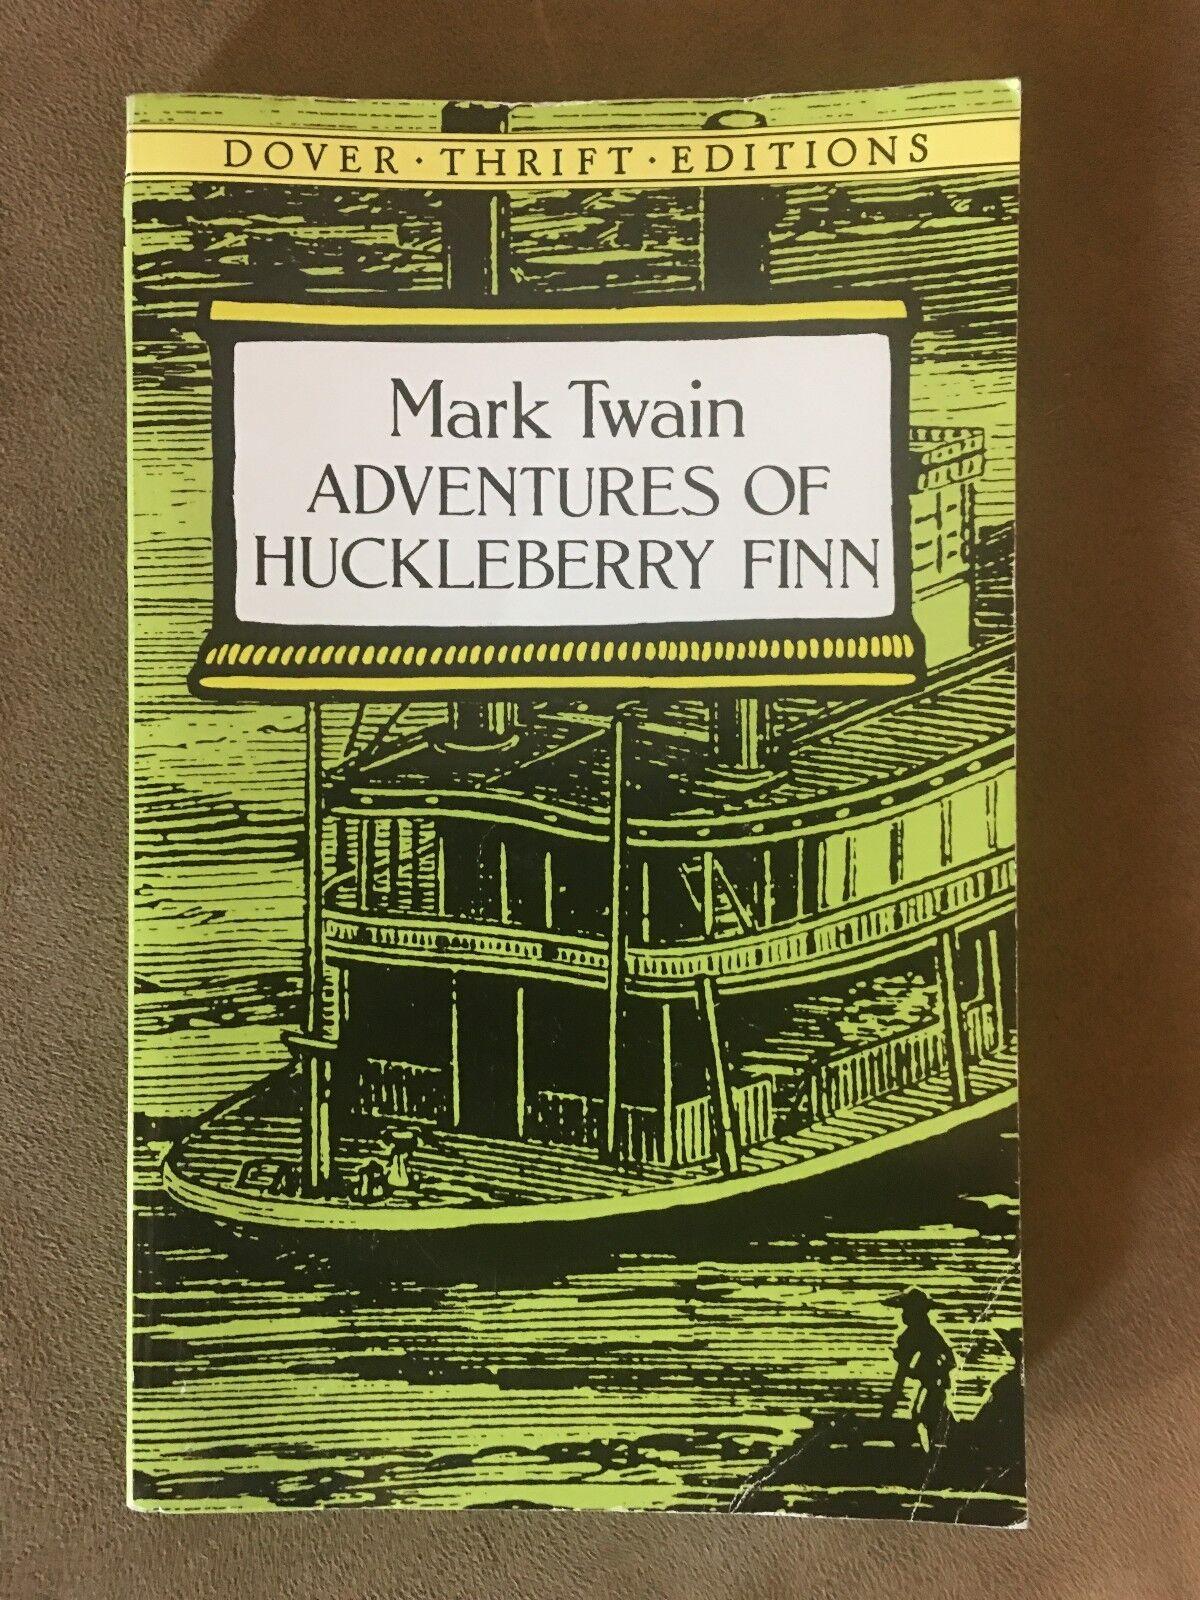 huckleberry finn book value